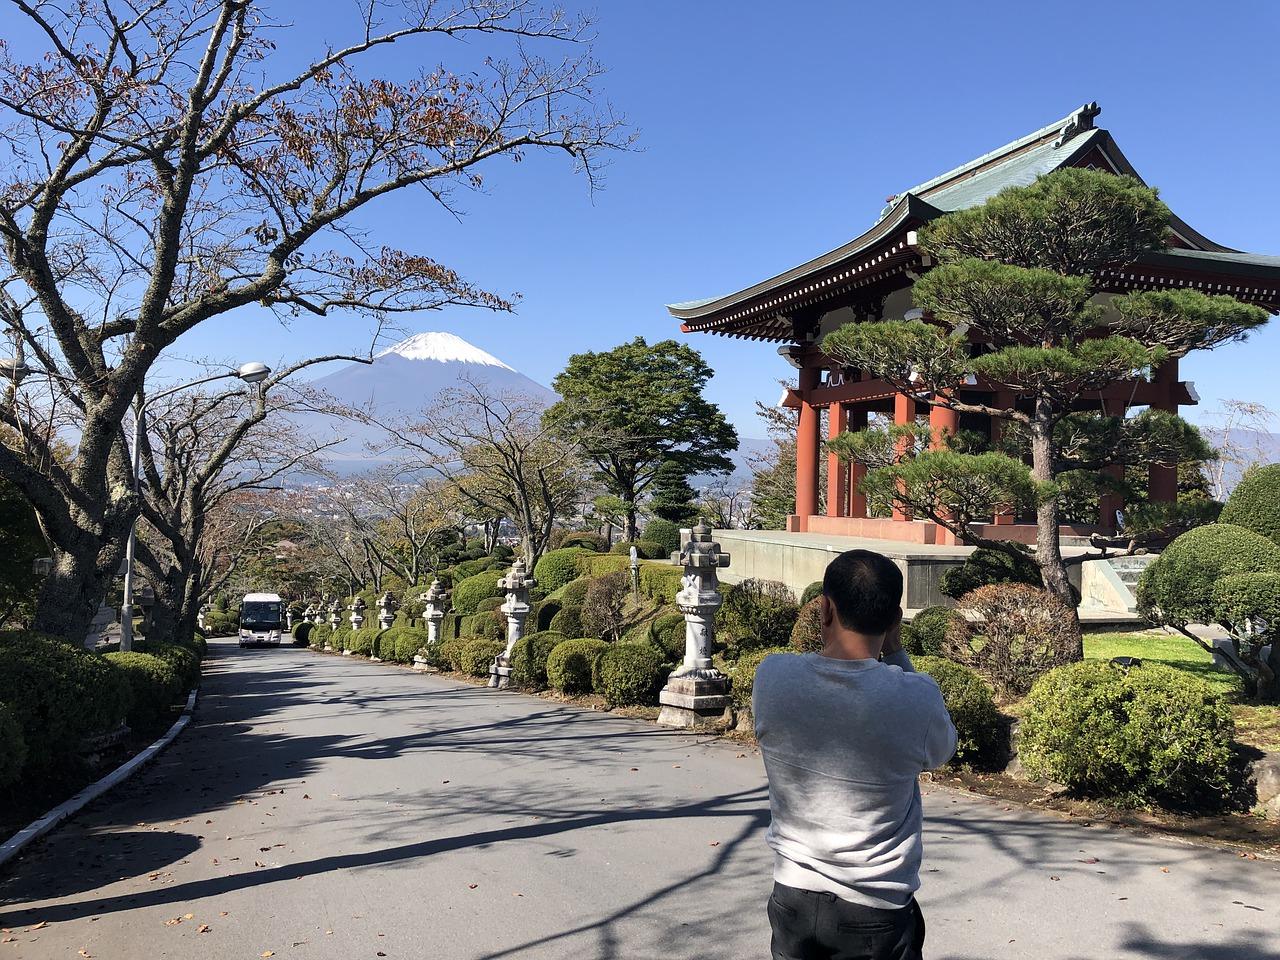 Waseda Students on Break Part 1 – A Change of Plans